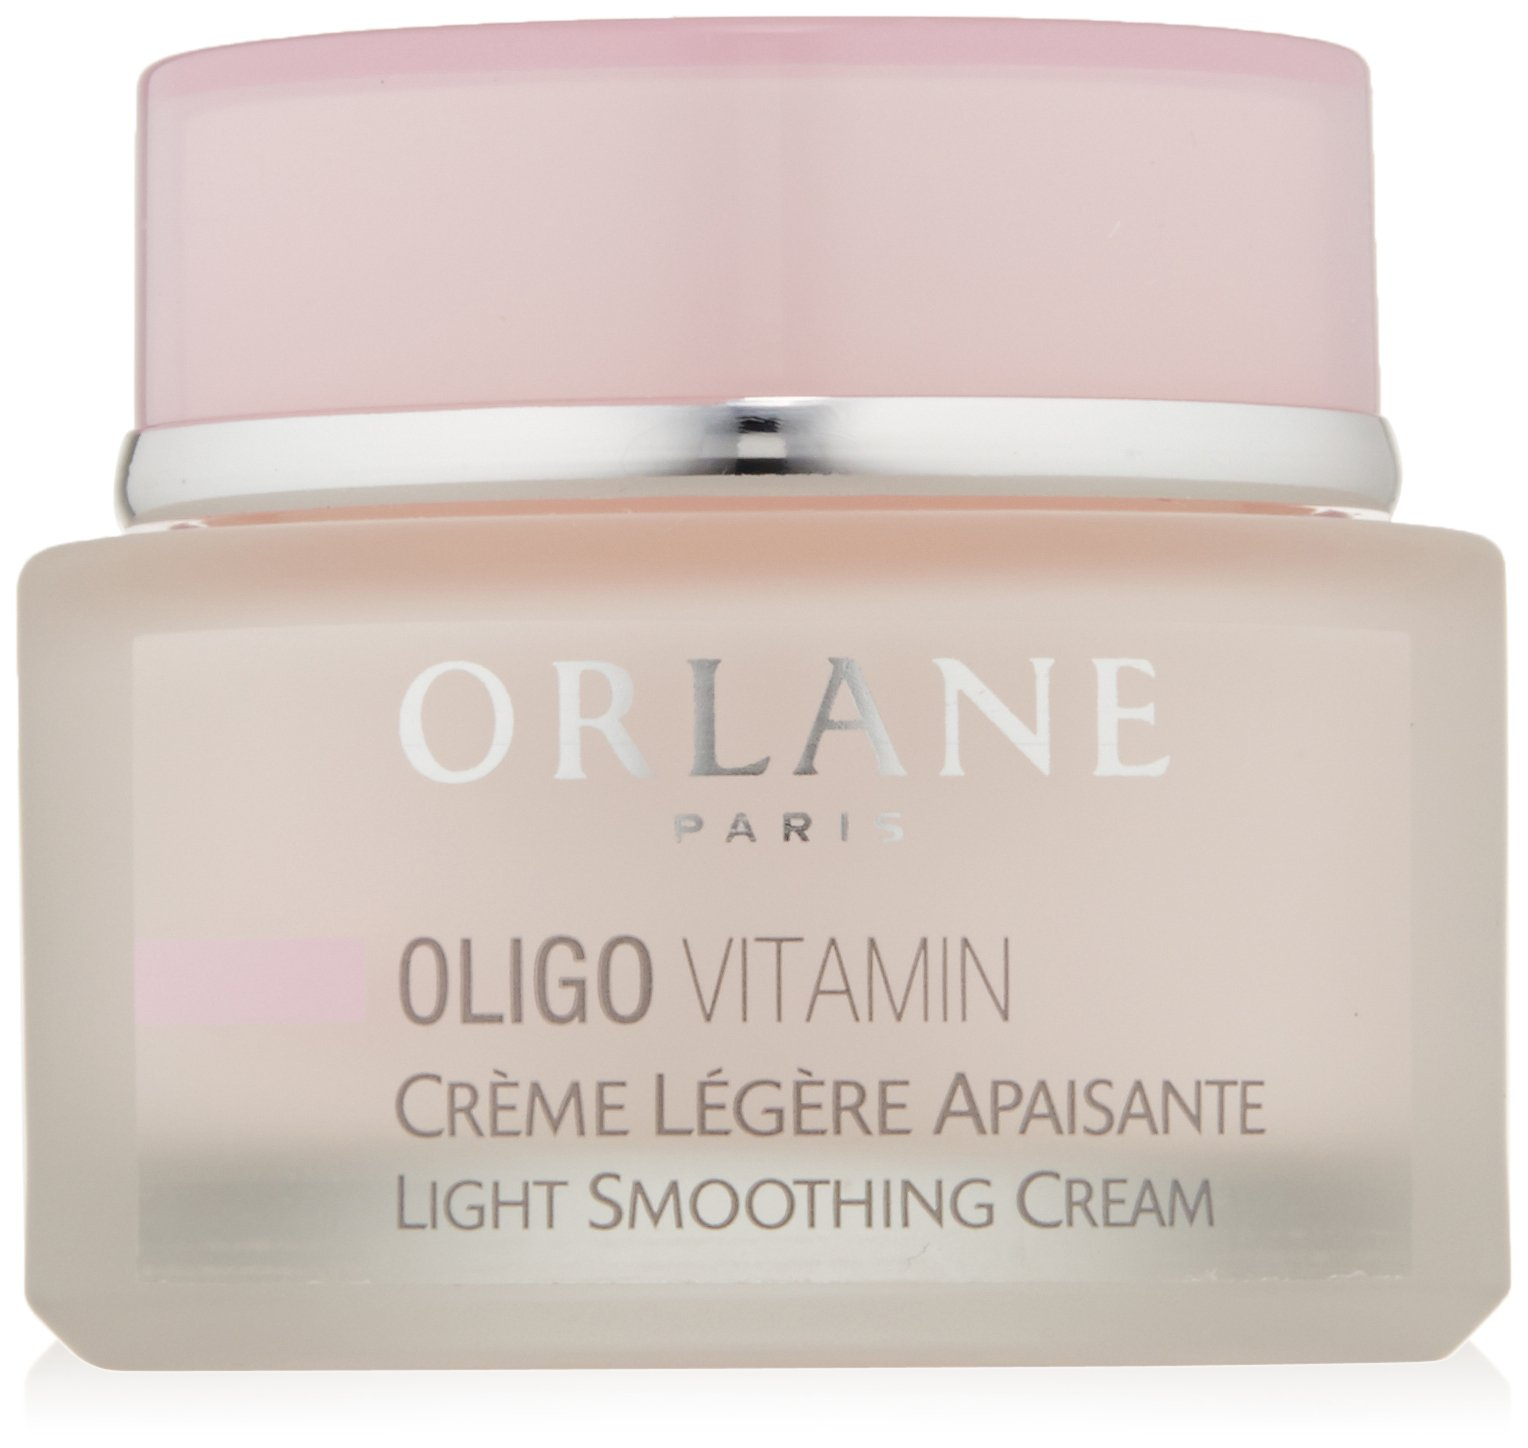 CDM product ORLANE PARIS Oligo Vitamin Light Smoothing Cream, 1.7 oz big image